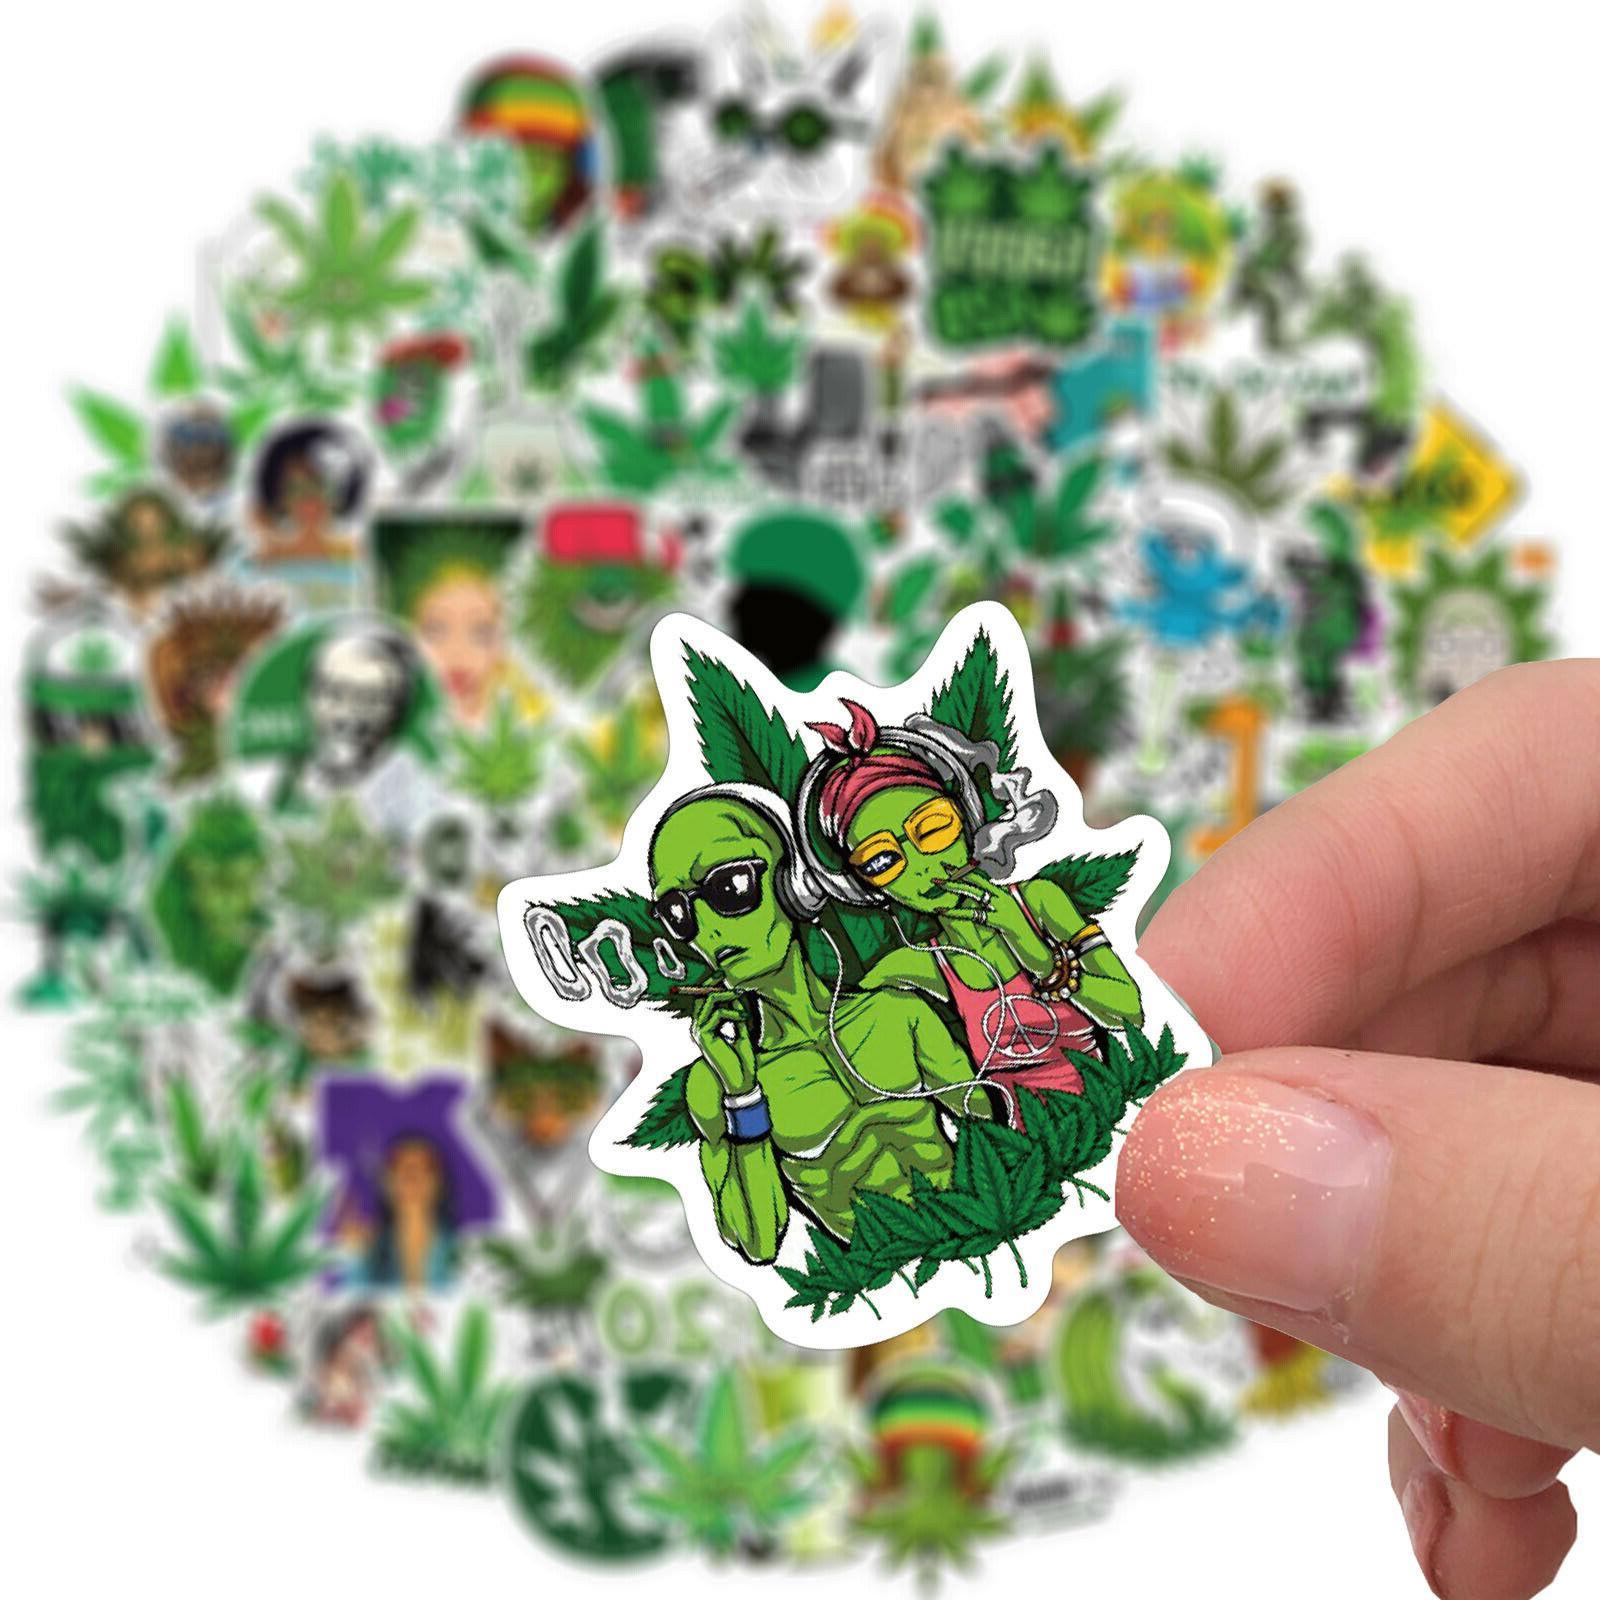 100pcs Weed Leaves Stickers Smoking Graffiti Luggage Laptop USA!